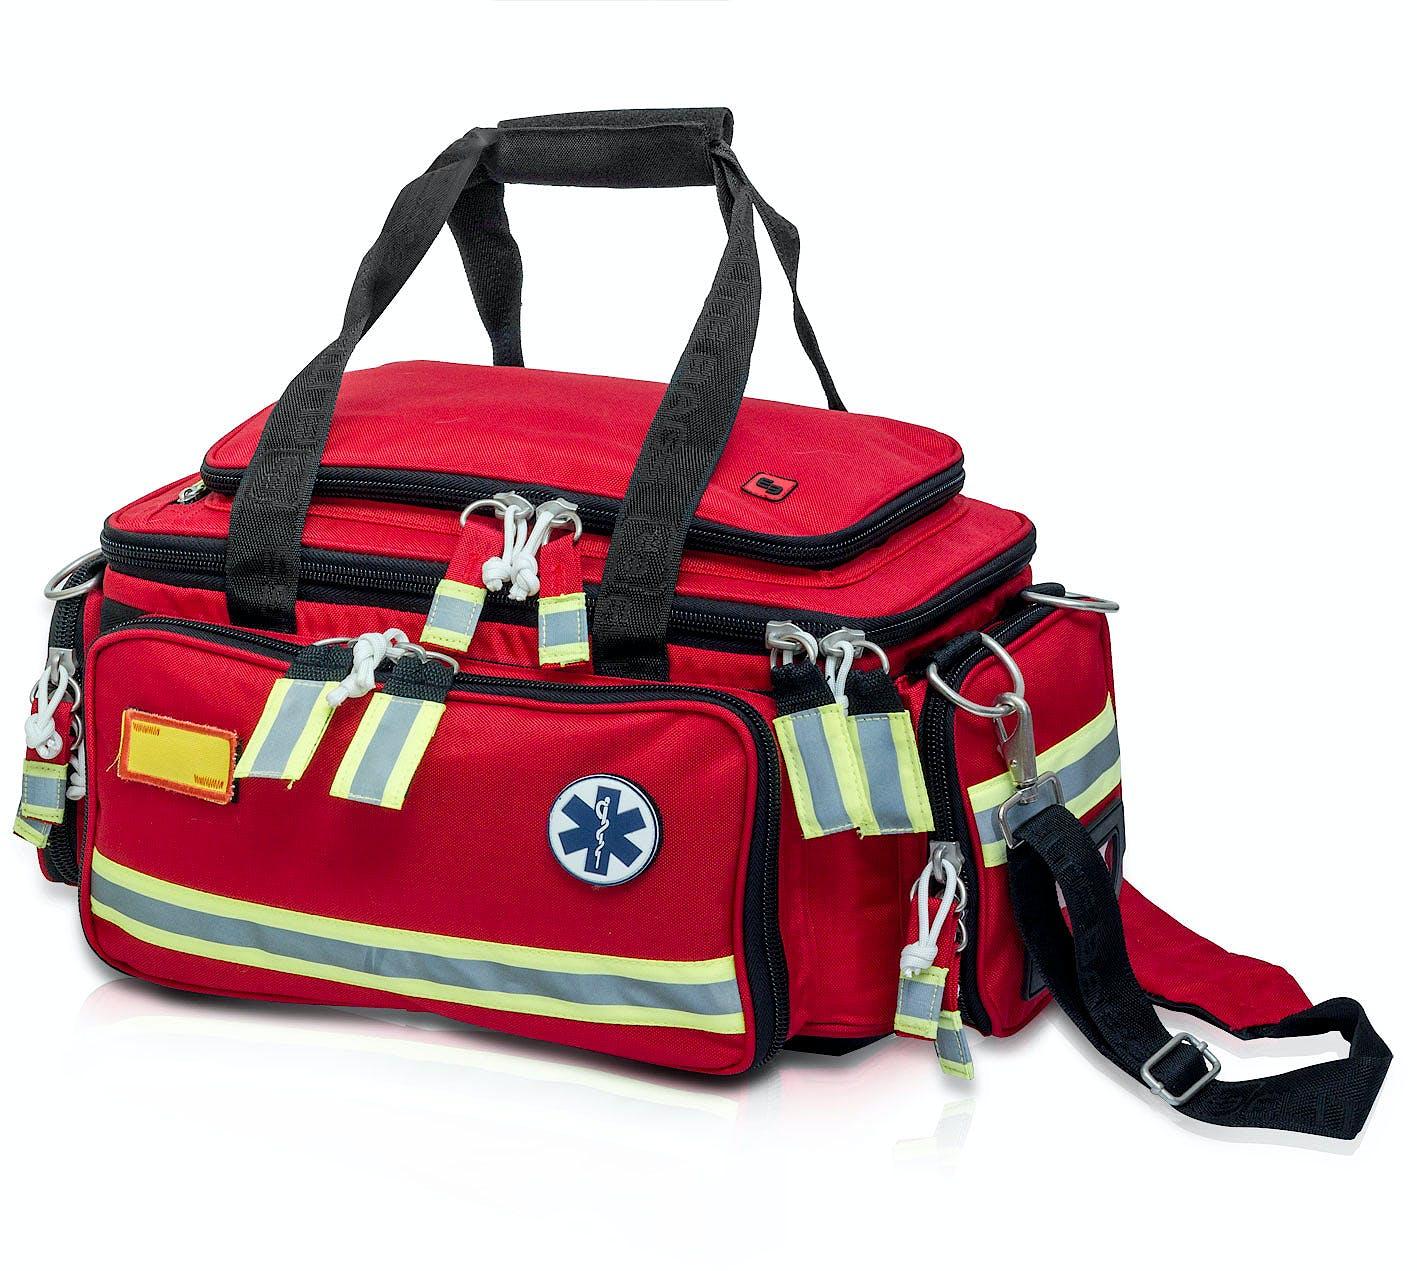 Bolsa de Emergencias para Soporte Vital Básico Modelo Extreme's EB02.008, Color Rojo